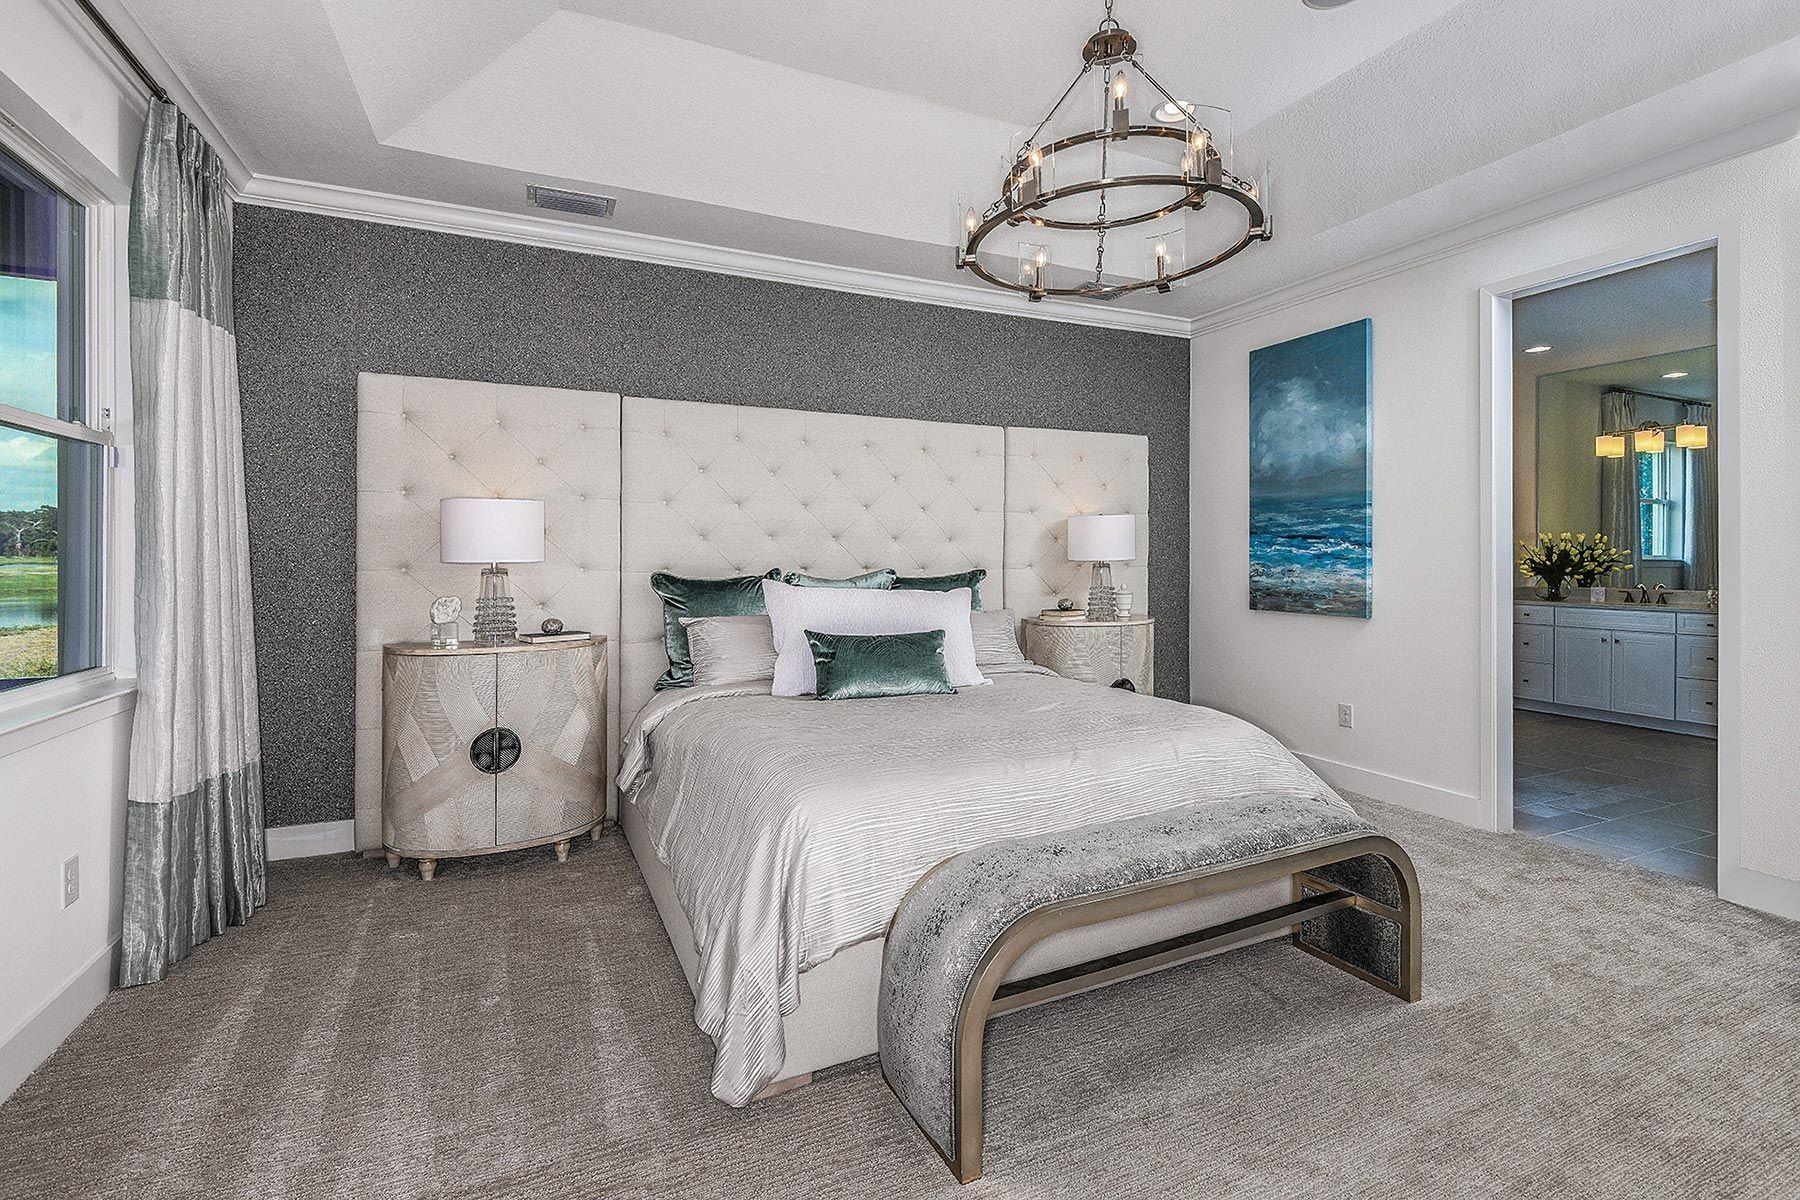 Bedroom featured in the Jubilee II By Mattamy Homes in Sarasota-Bradenton, FL